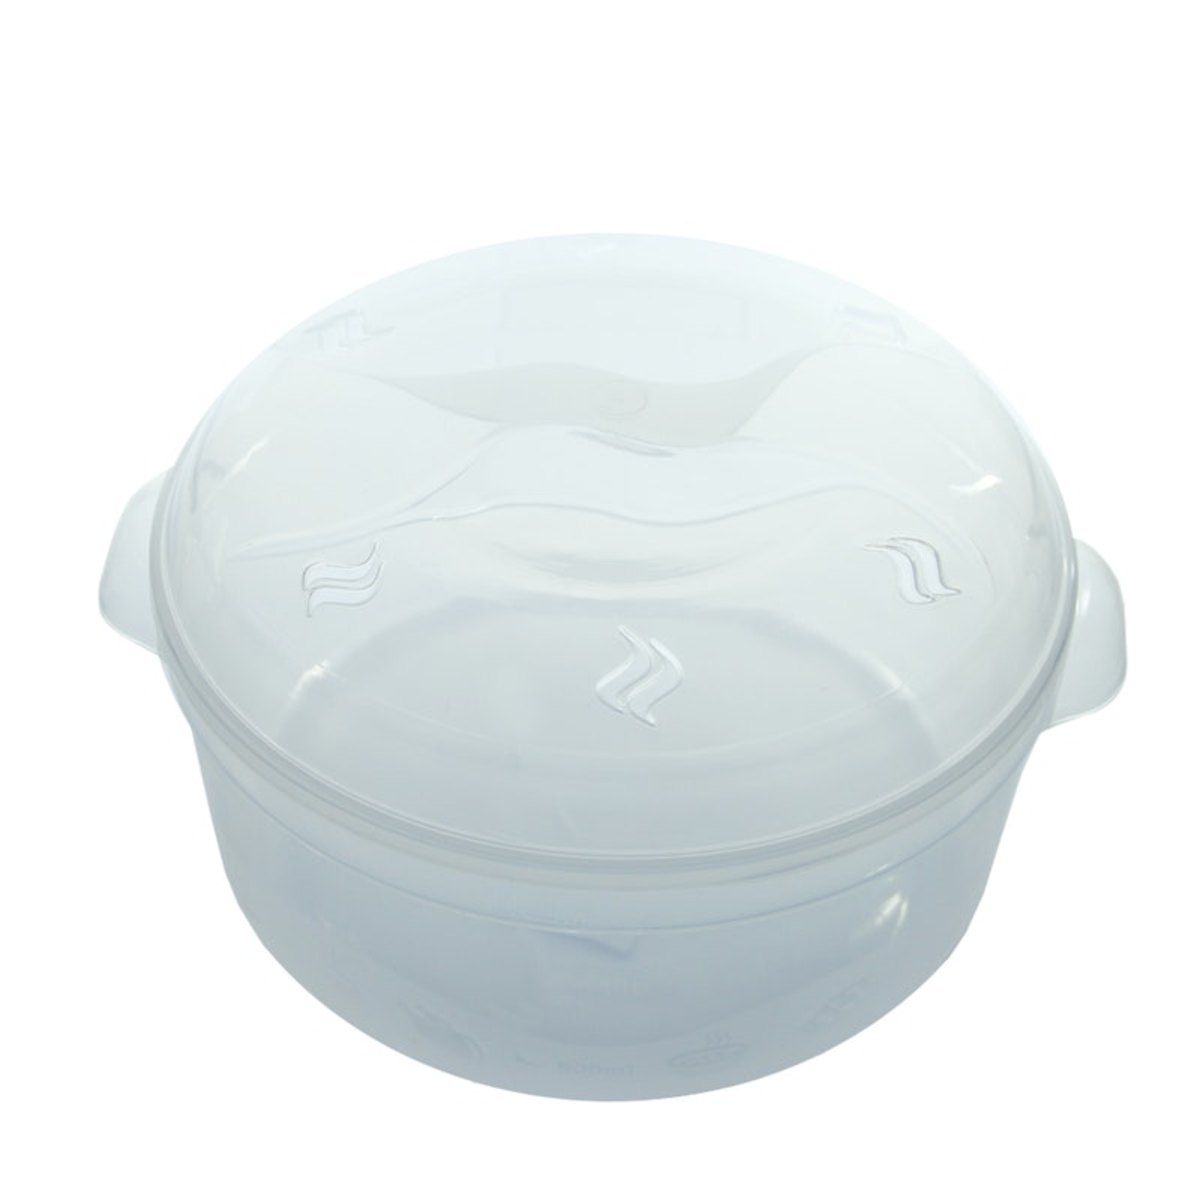 Panela para Microondas de Plástico 2,5L Plasvale